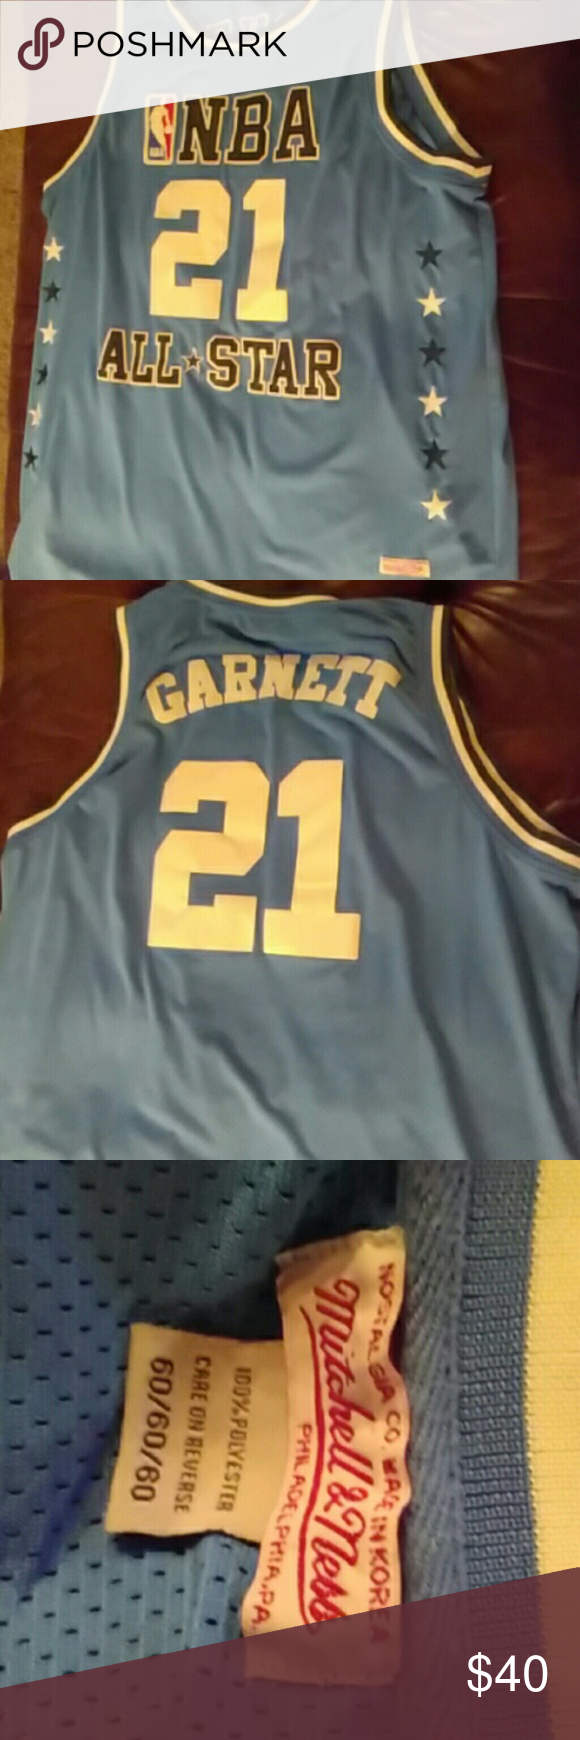 timeless design 2a309 ff9fa Kevin Garnett Hardwood Classic jersey Basketball jersey ...